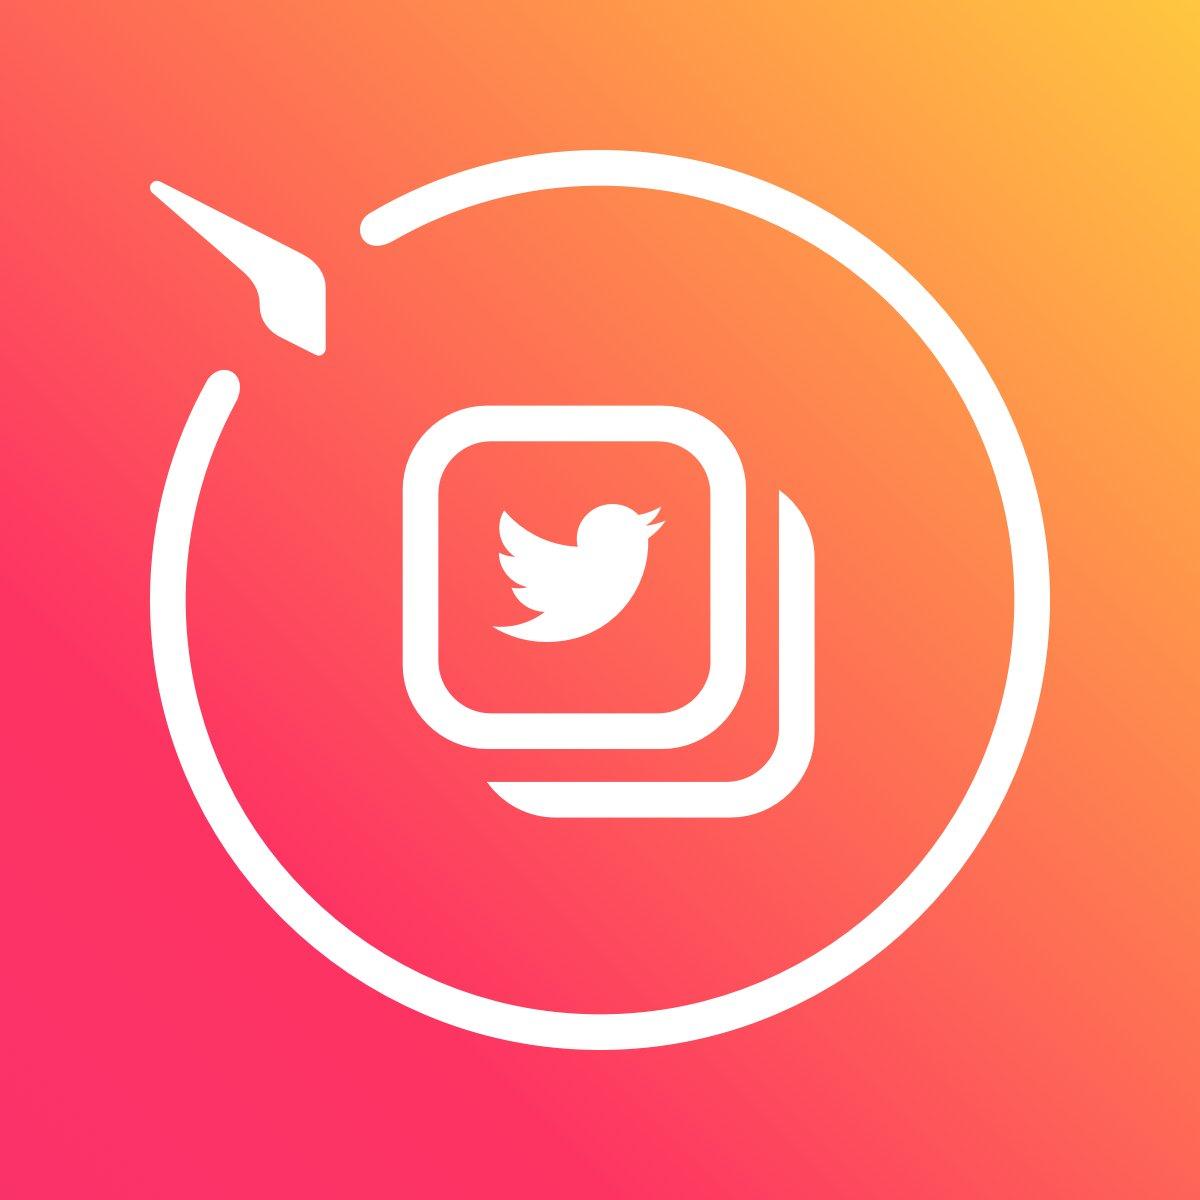 Shopify Twitter Feed app by Elfsight